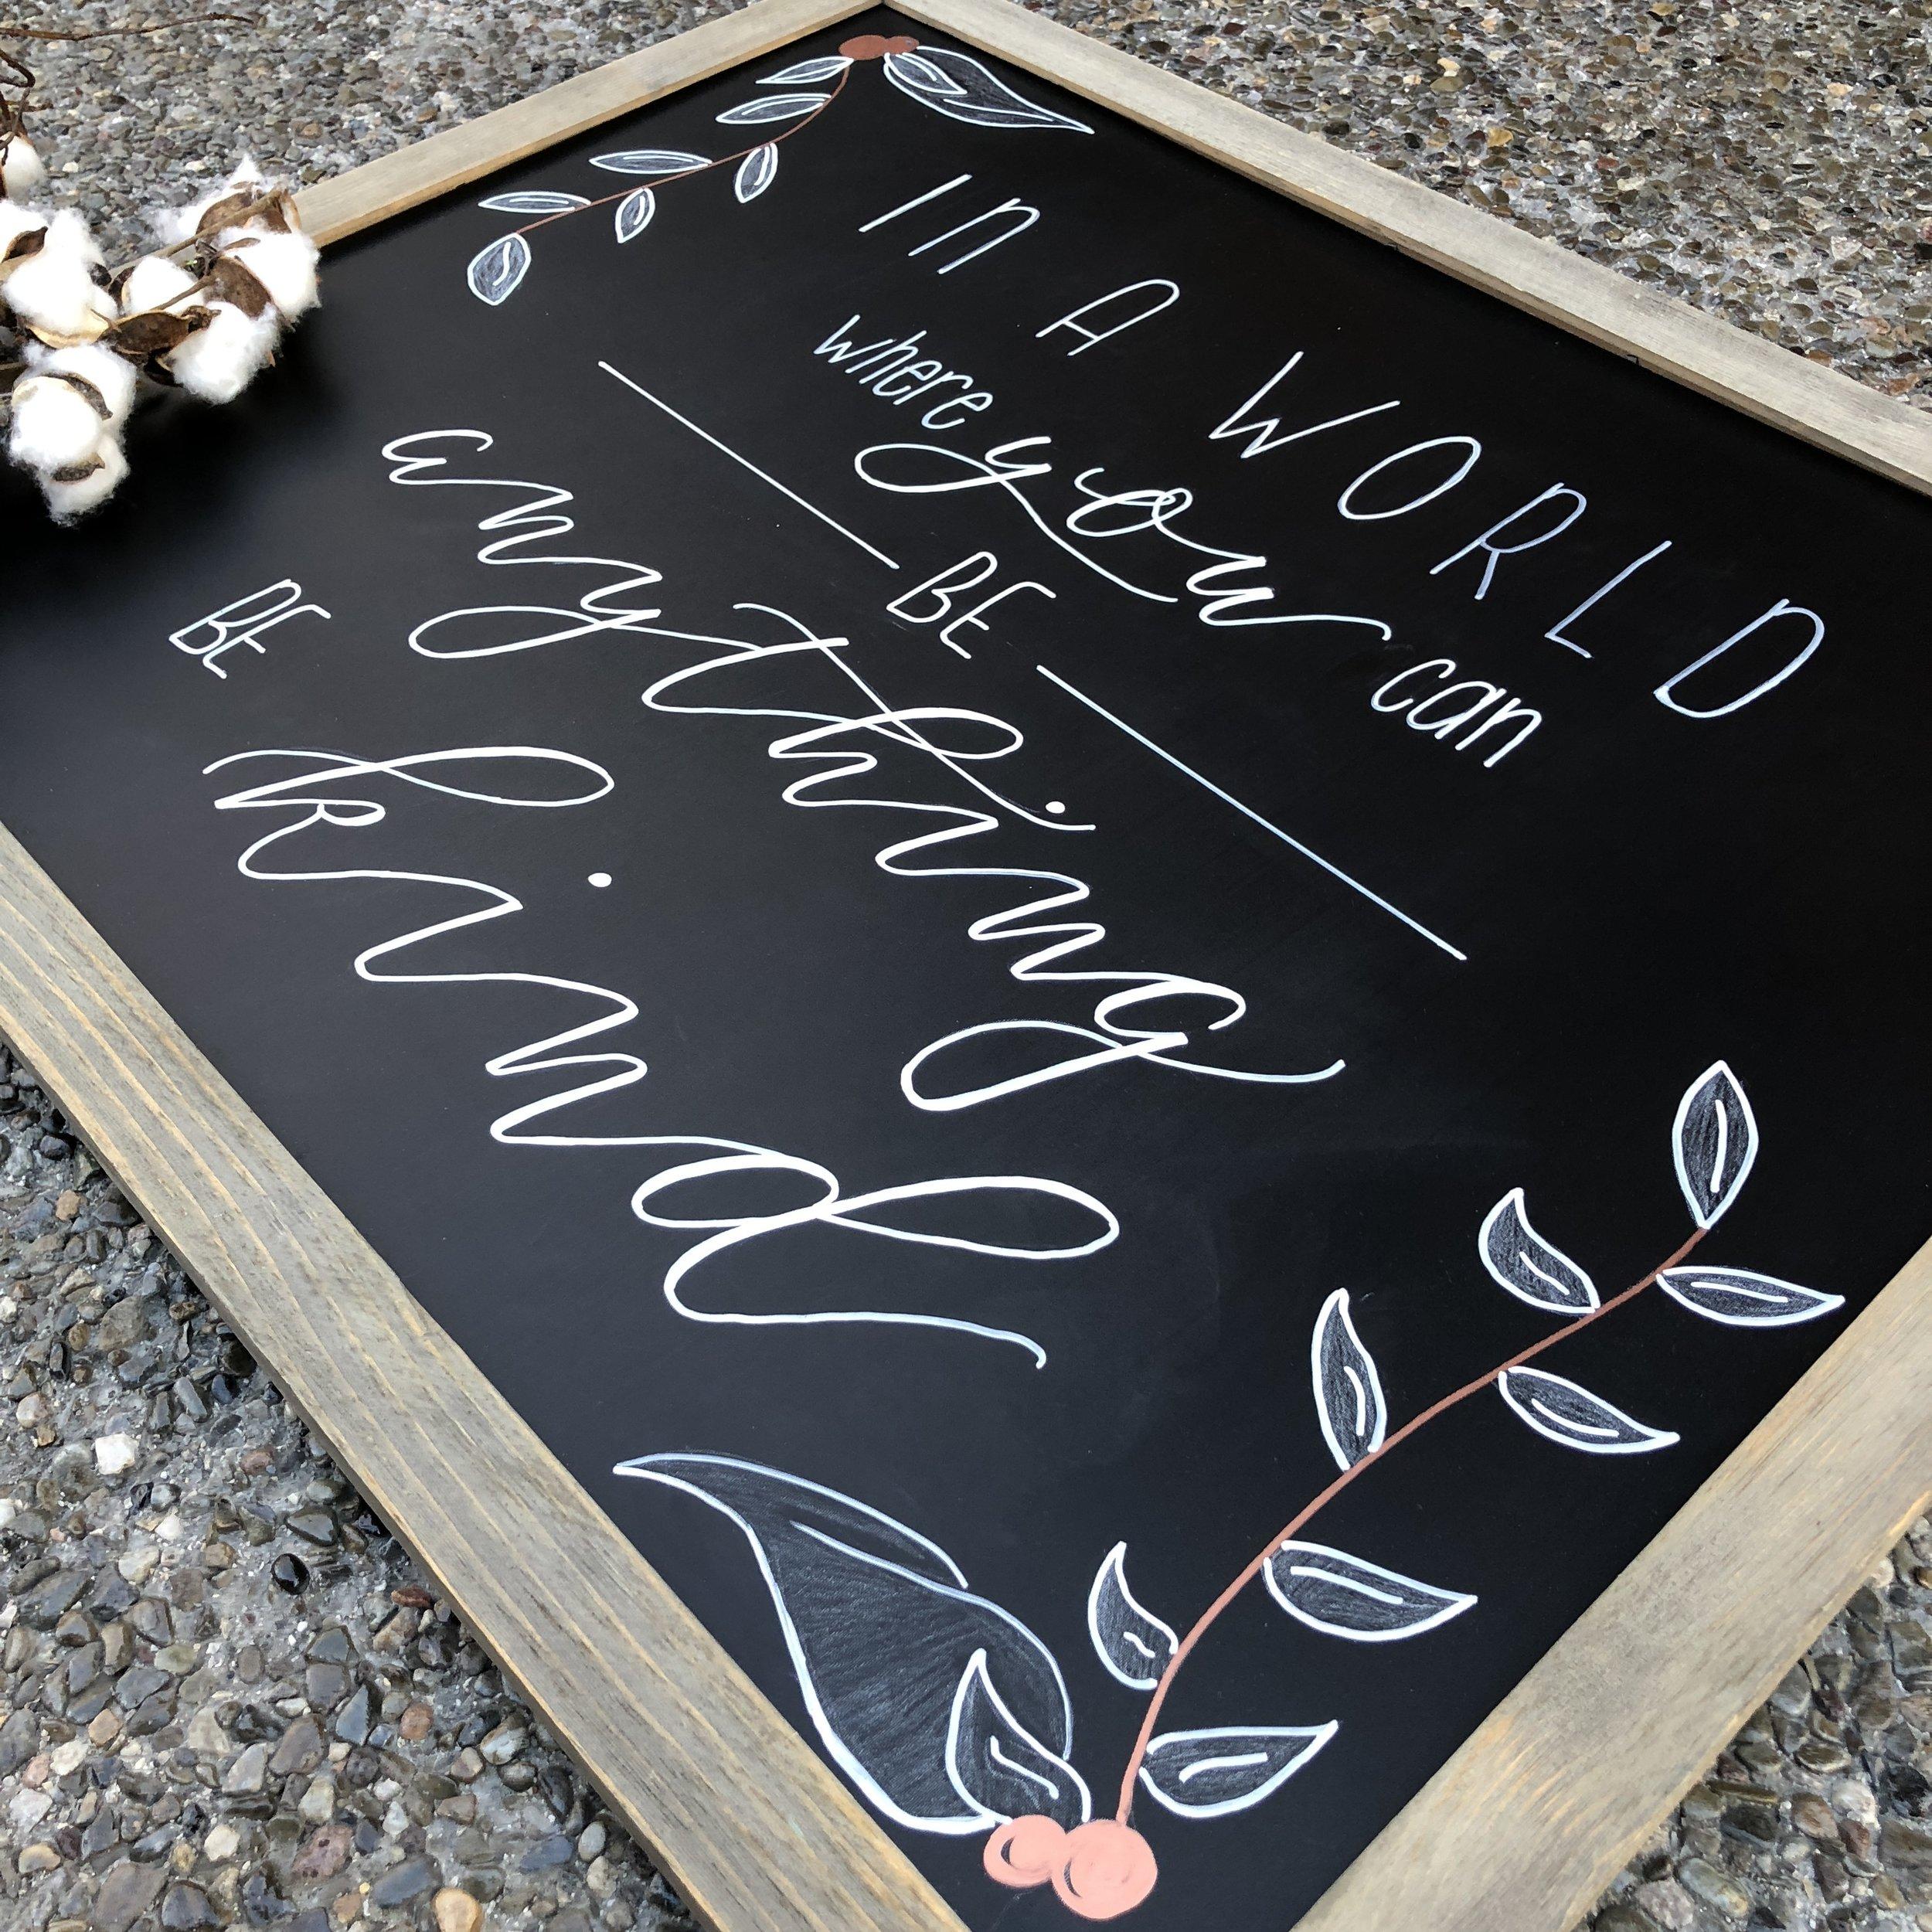 Central PA, York PA, JesSmith Designs, custom, wedding, invitations, bridal, announcements, save the date, birth, baby, motherhood, hanover, calligraphy, handlettering, wedding invitations, lancaster, gettysburg-11-22 15.58.30.jpg